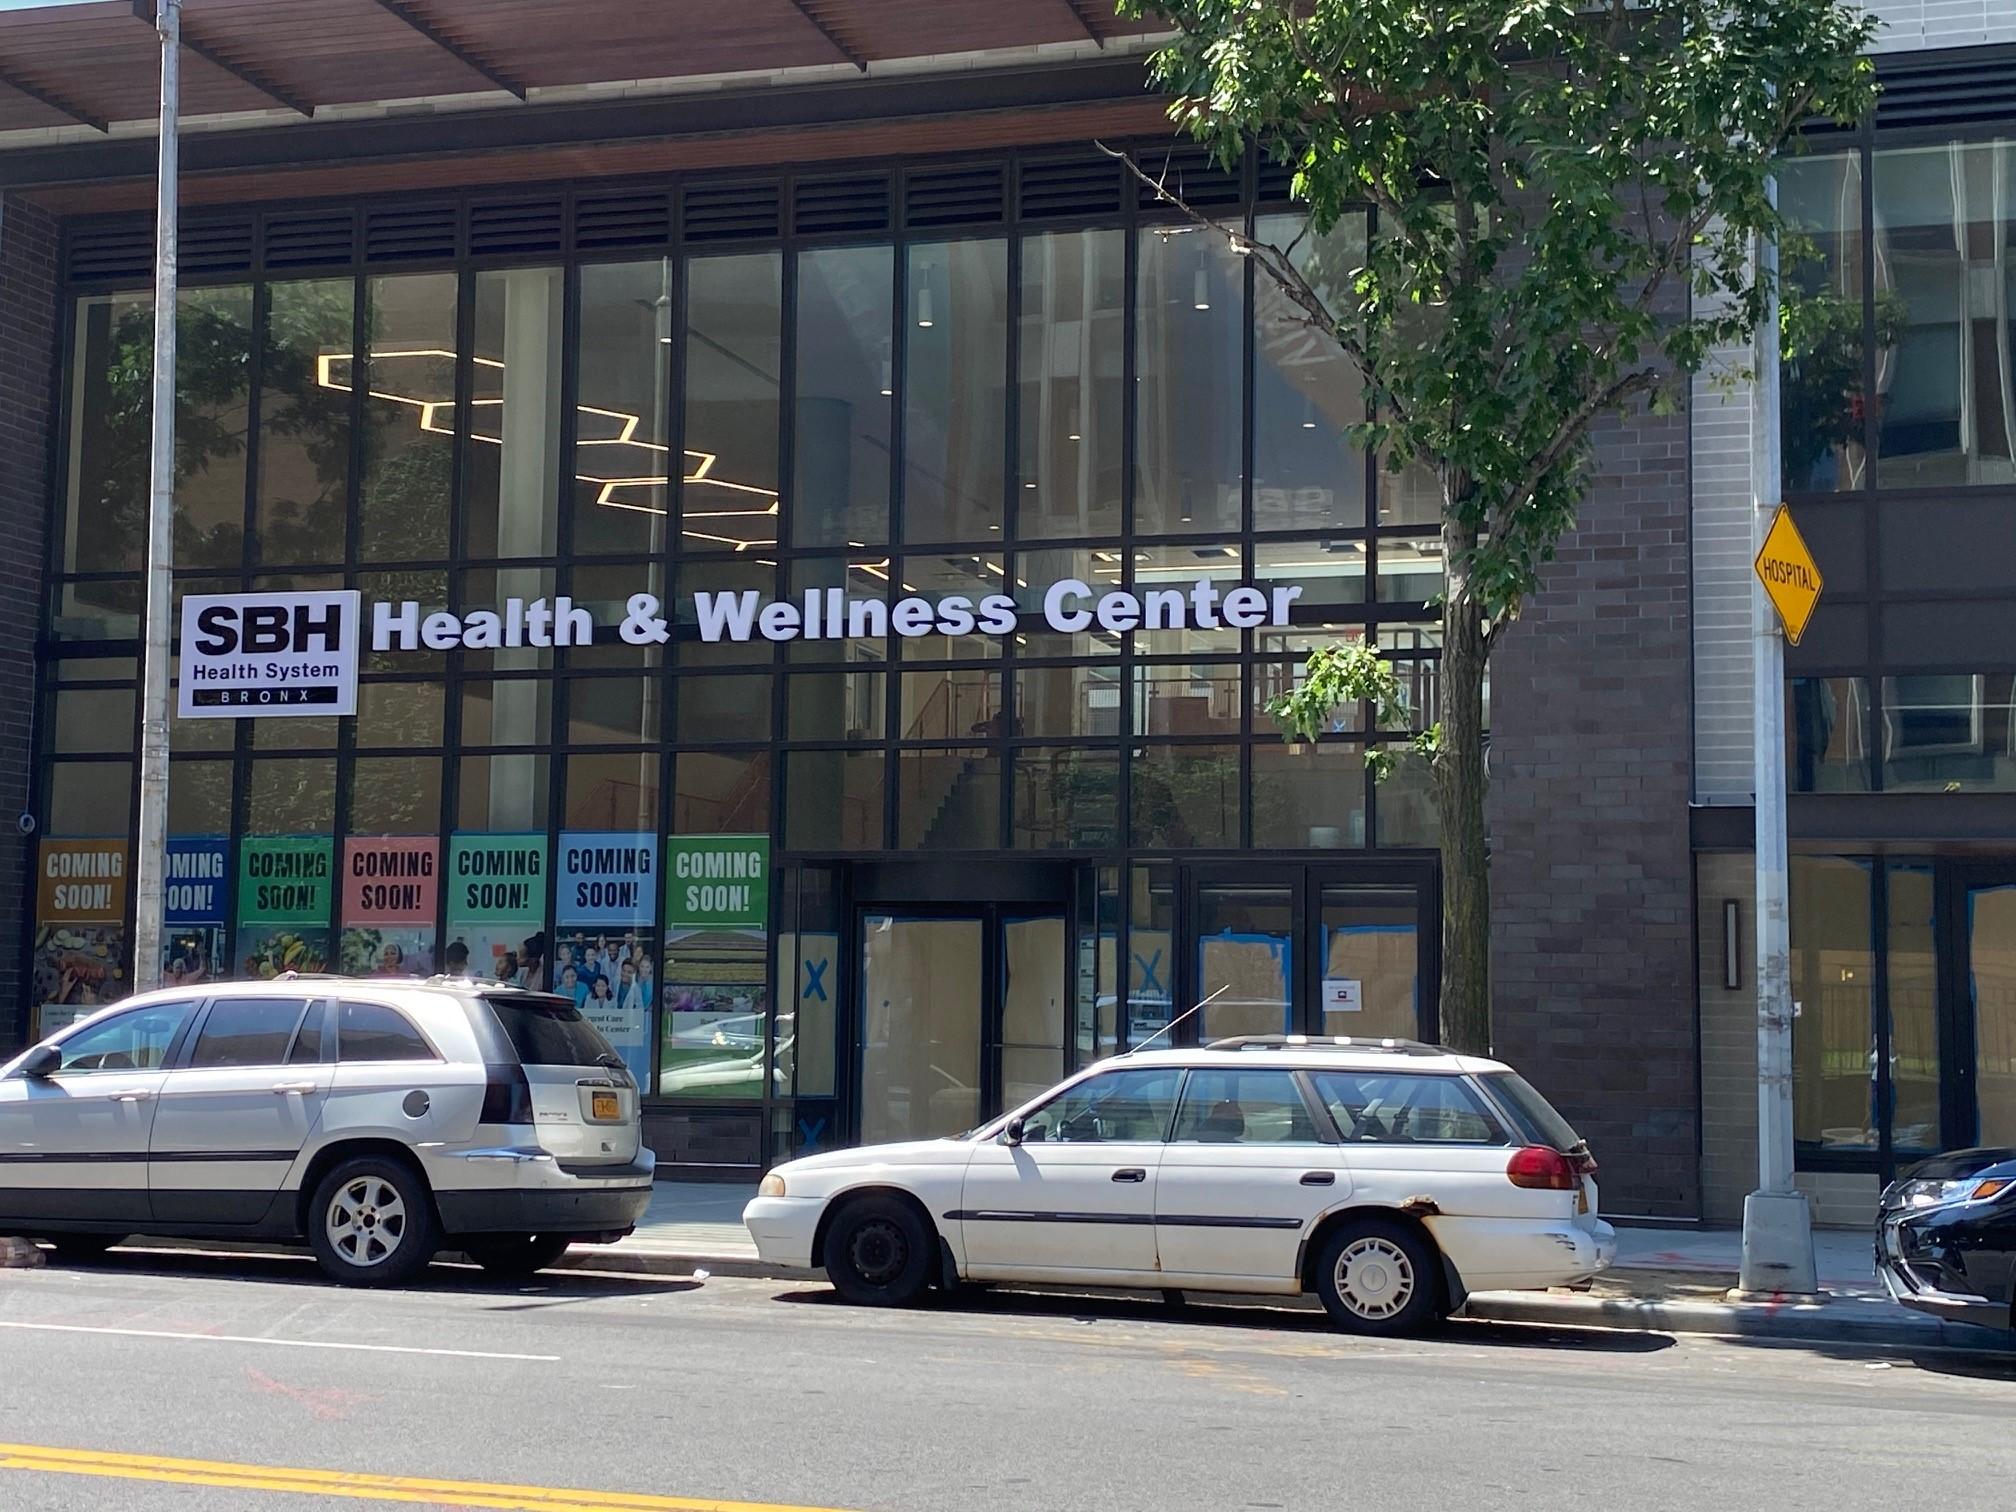 SBH-Health-and-Wellness-Entrance-r